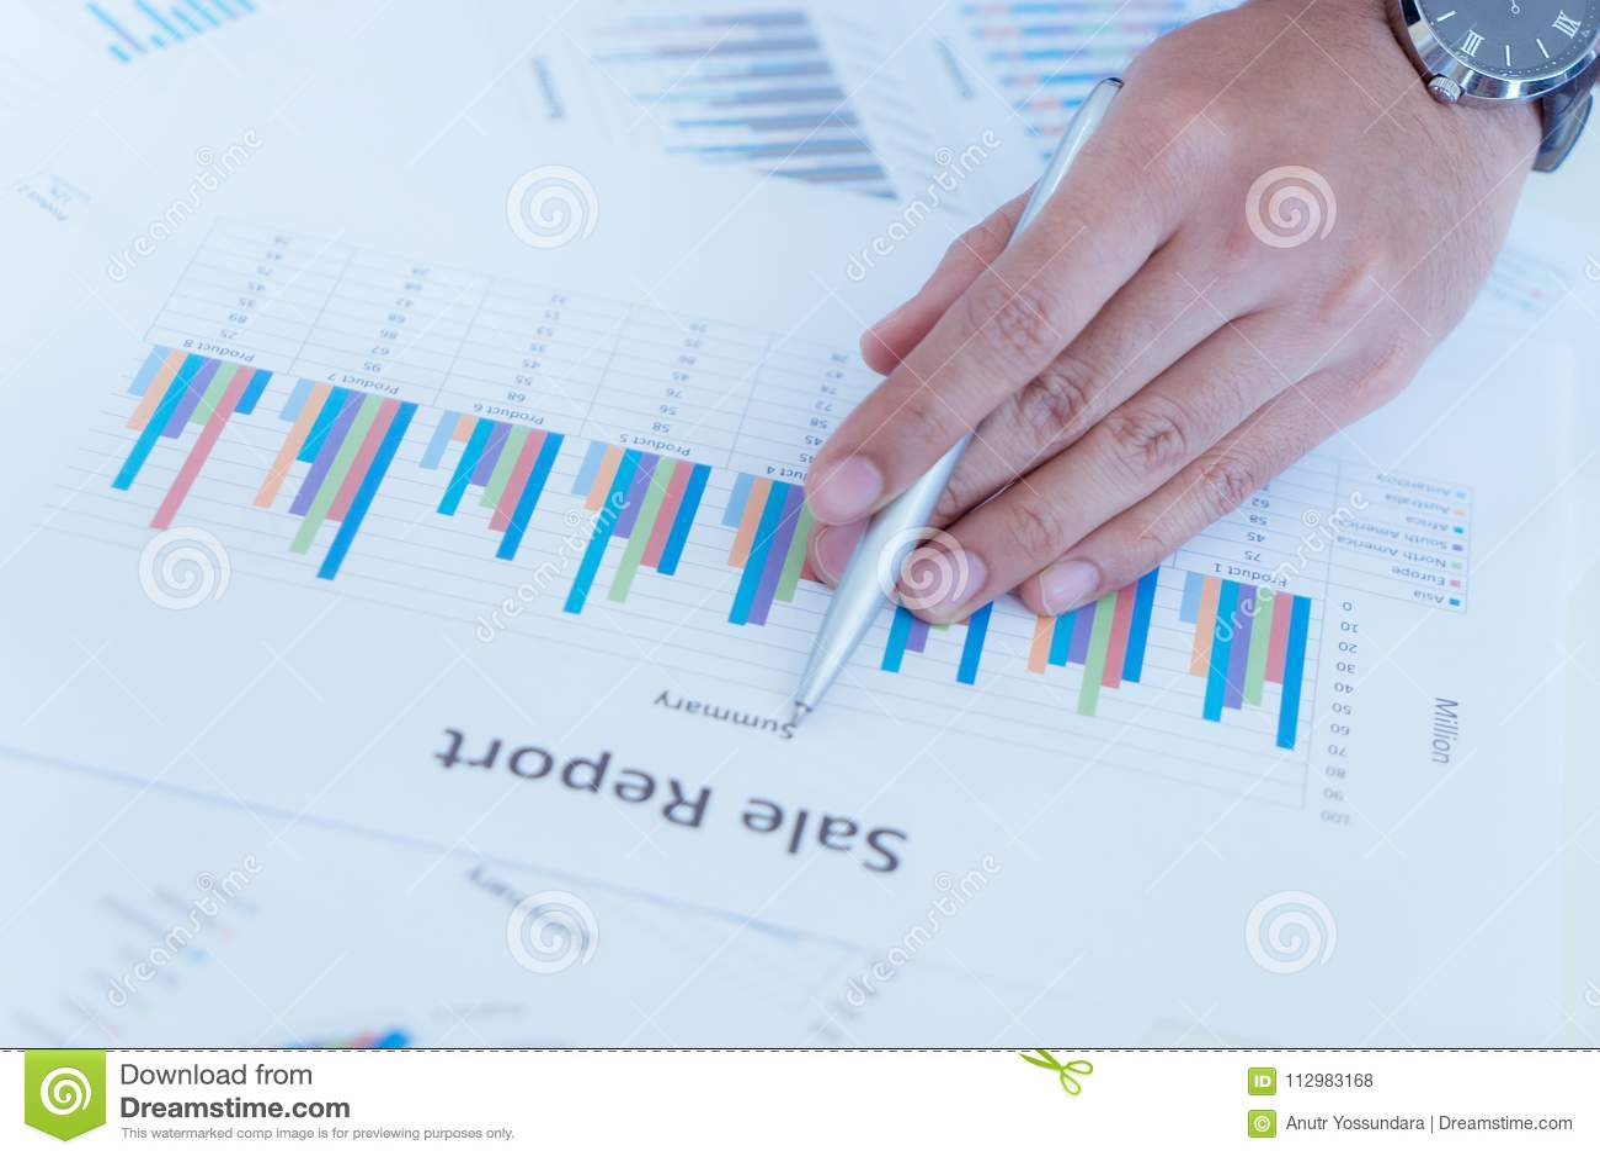 Business man marking on data sheet using pen